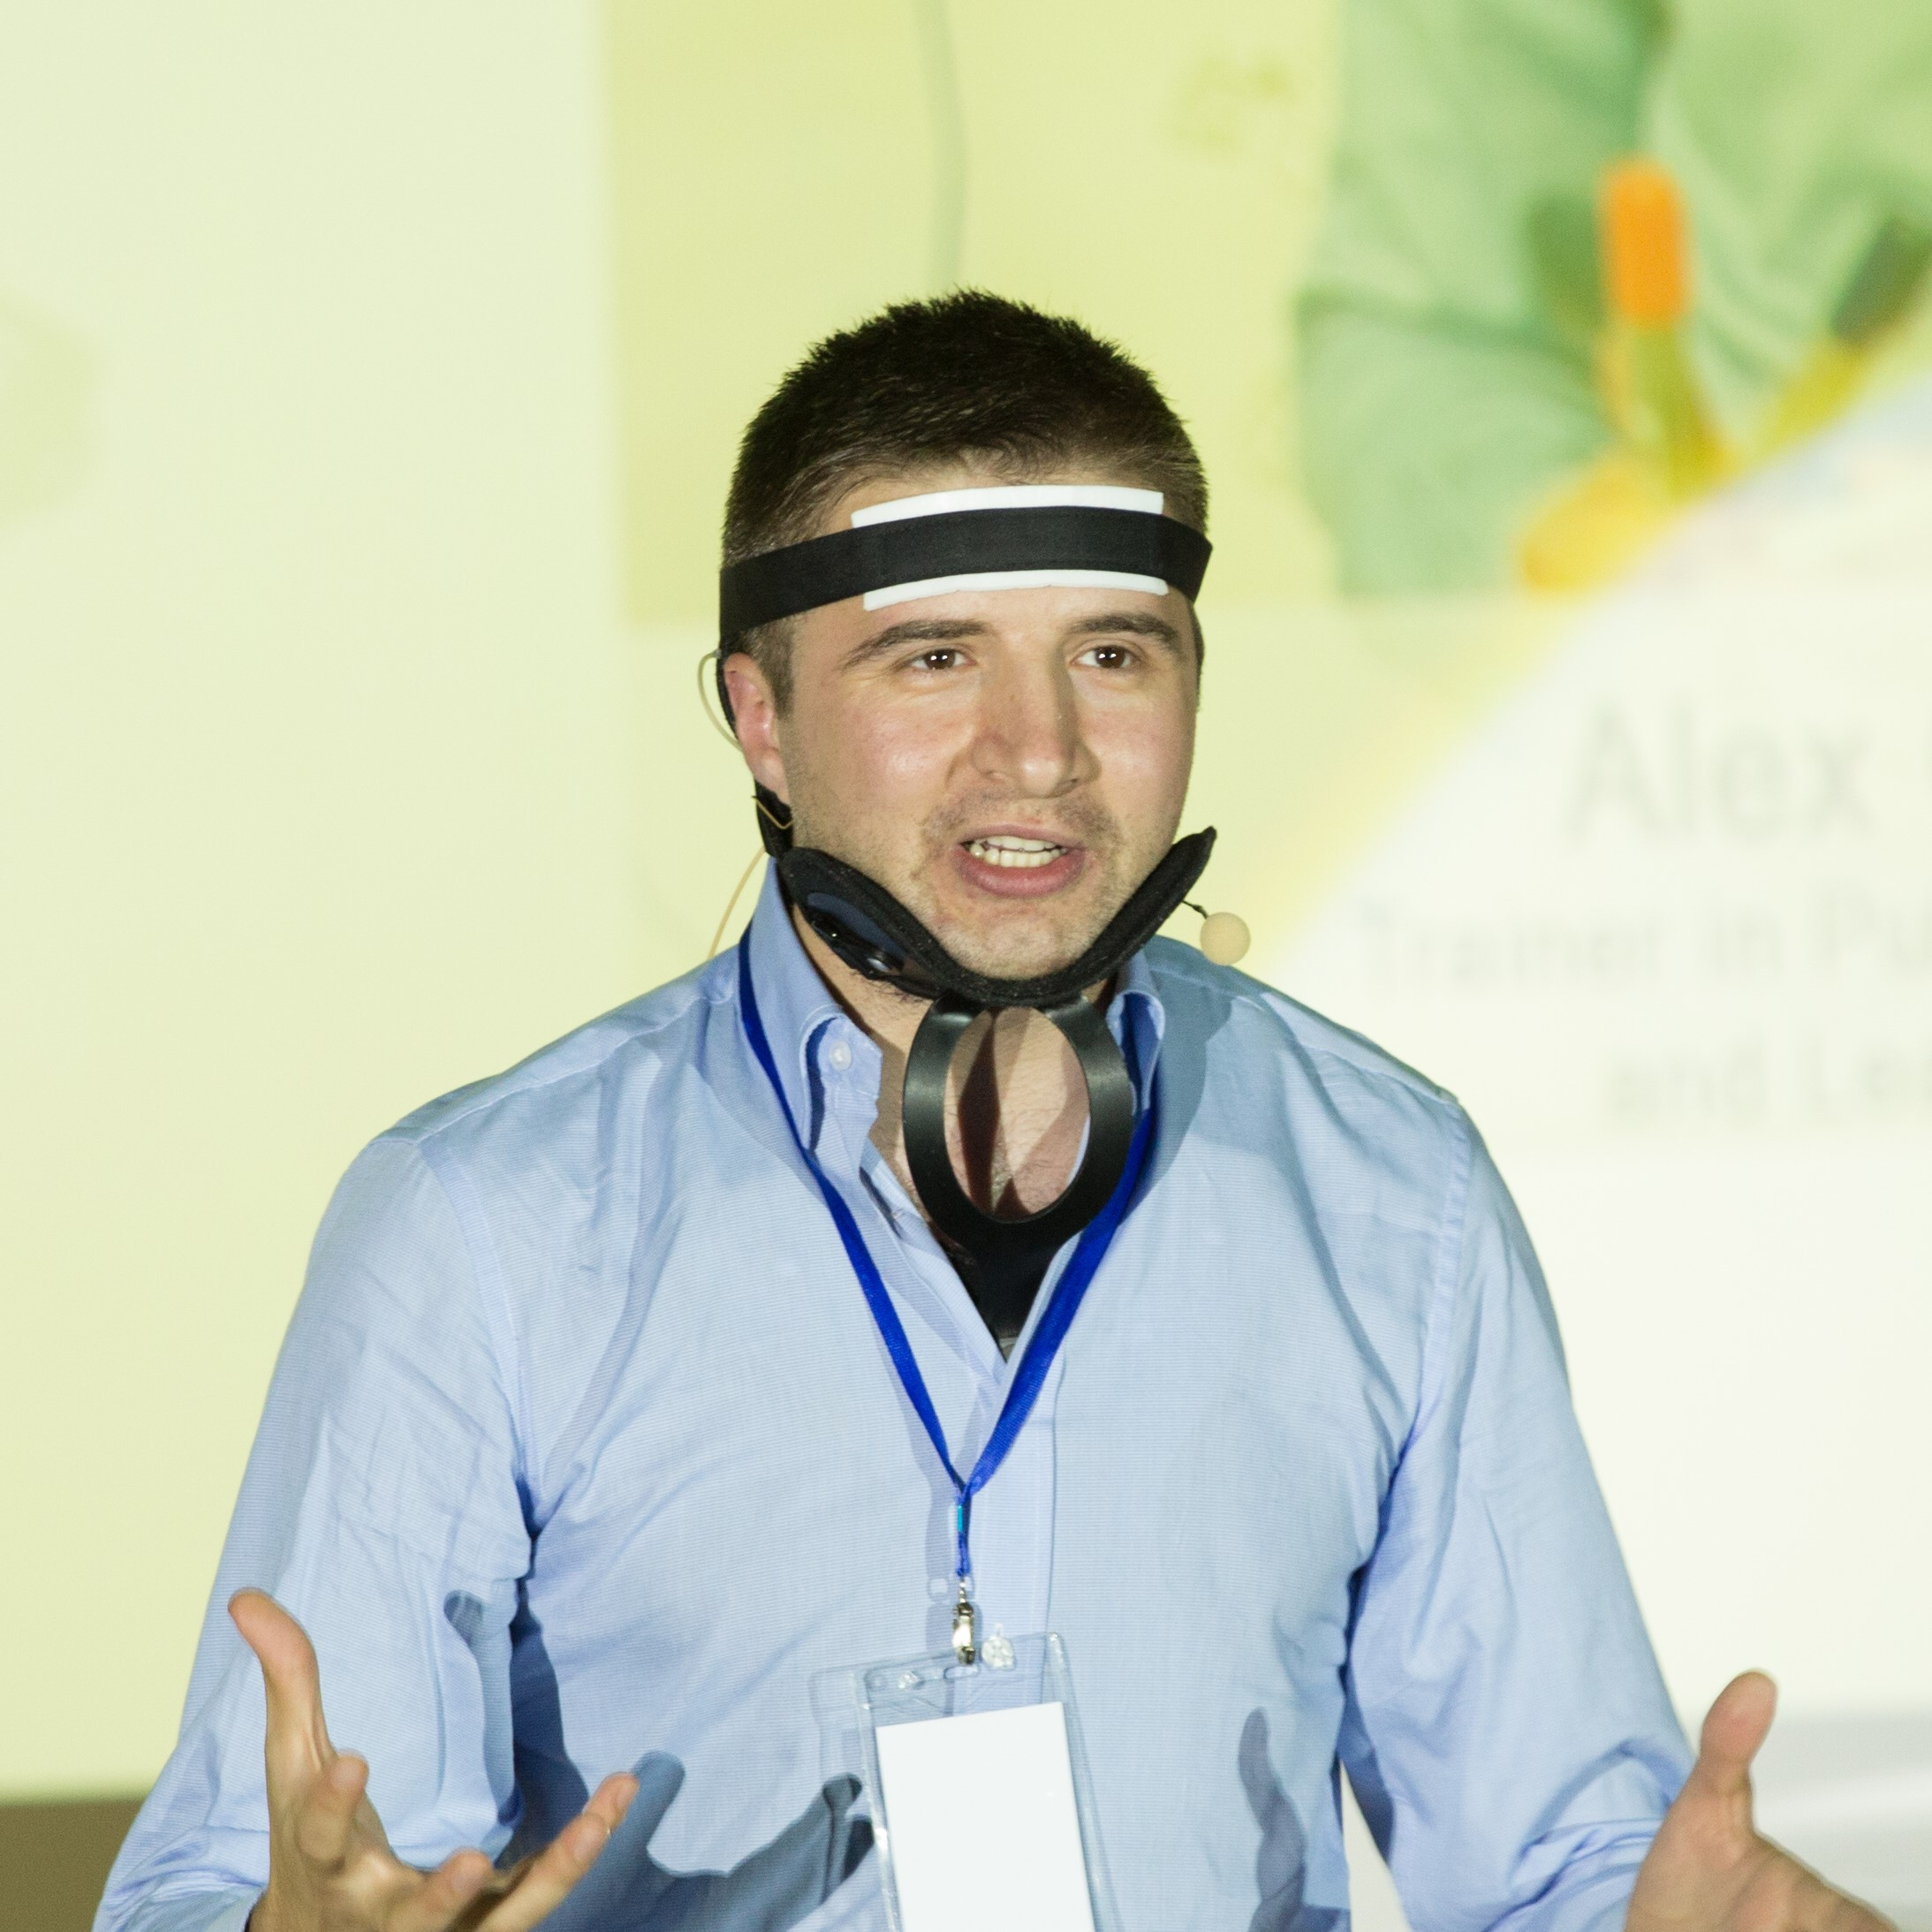 Alex Glod